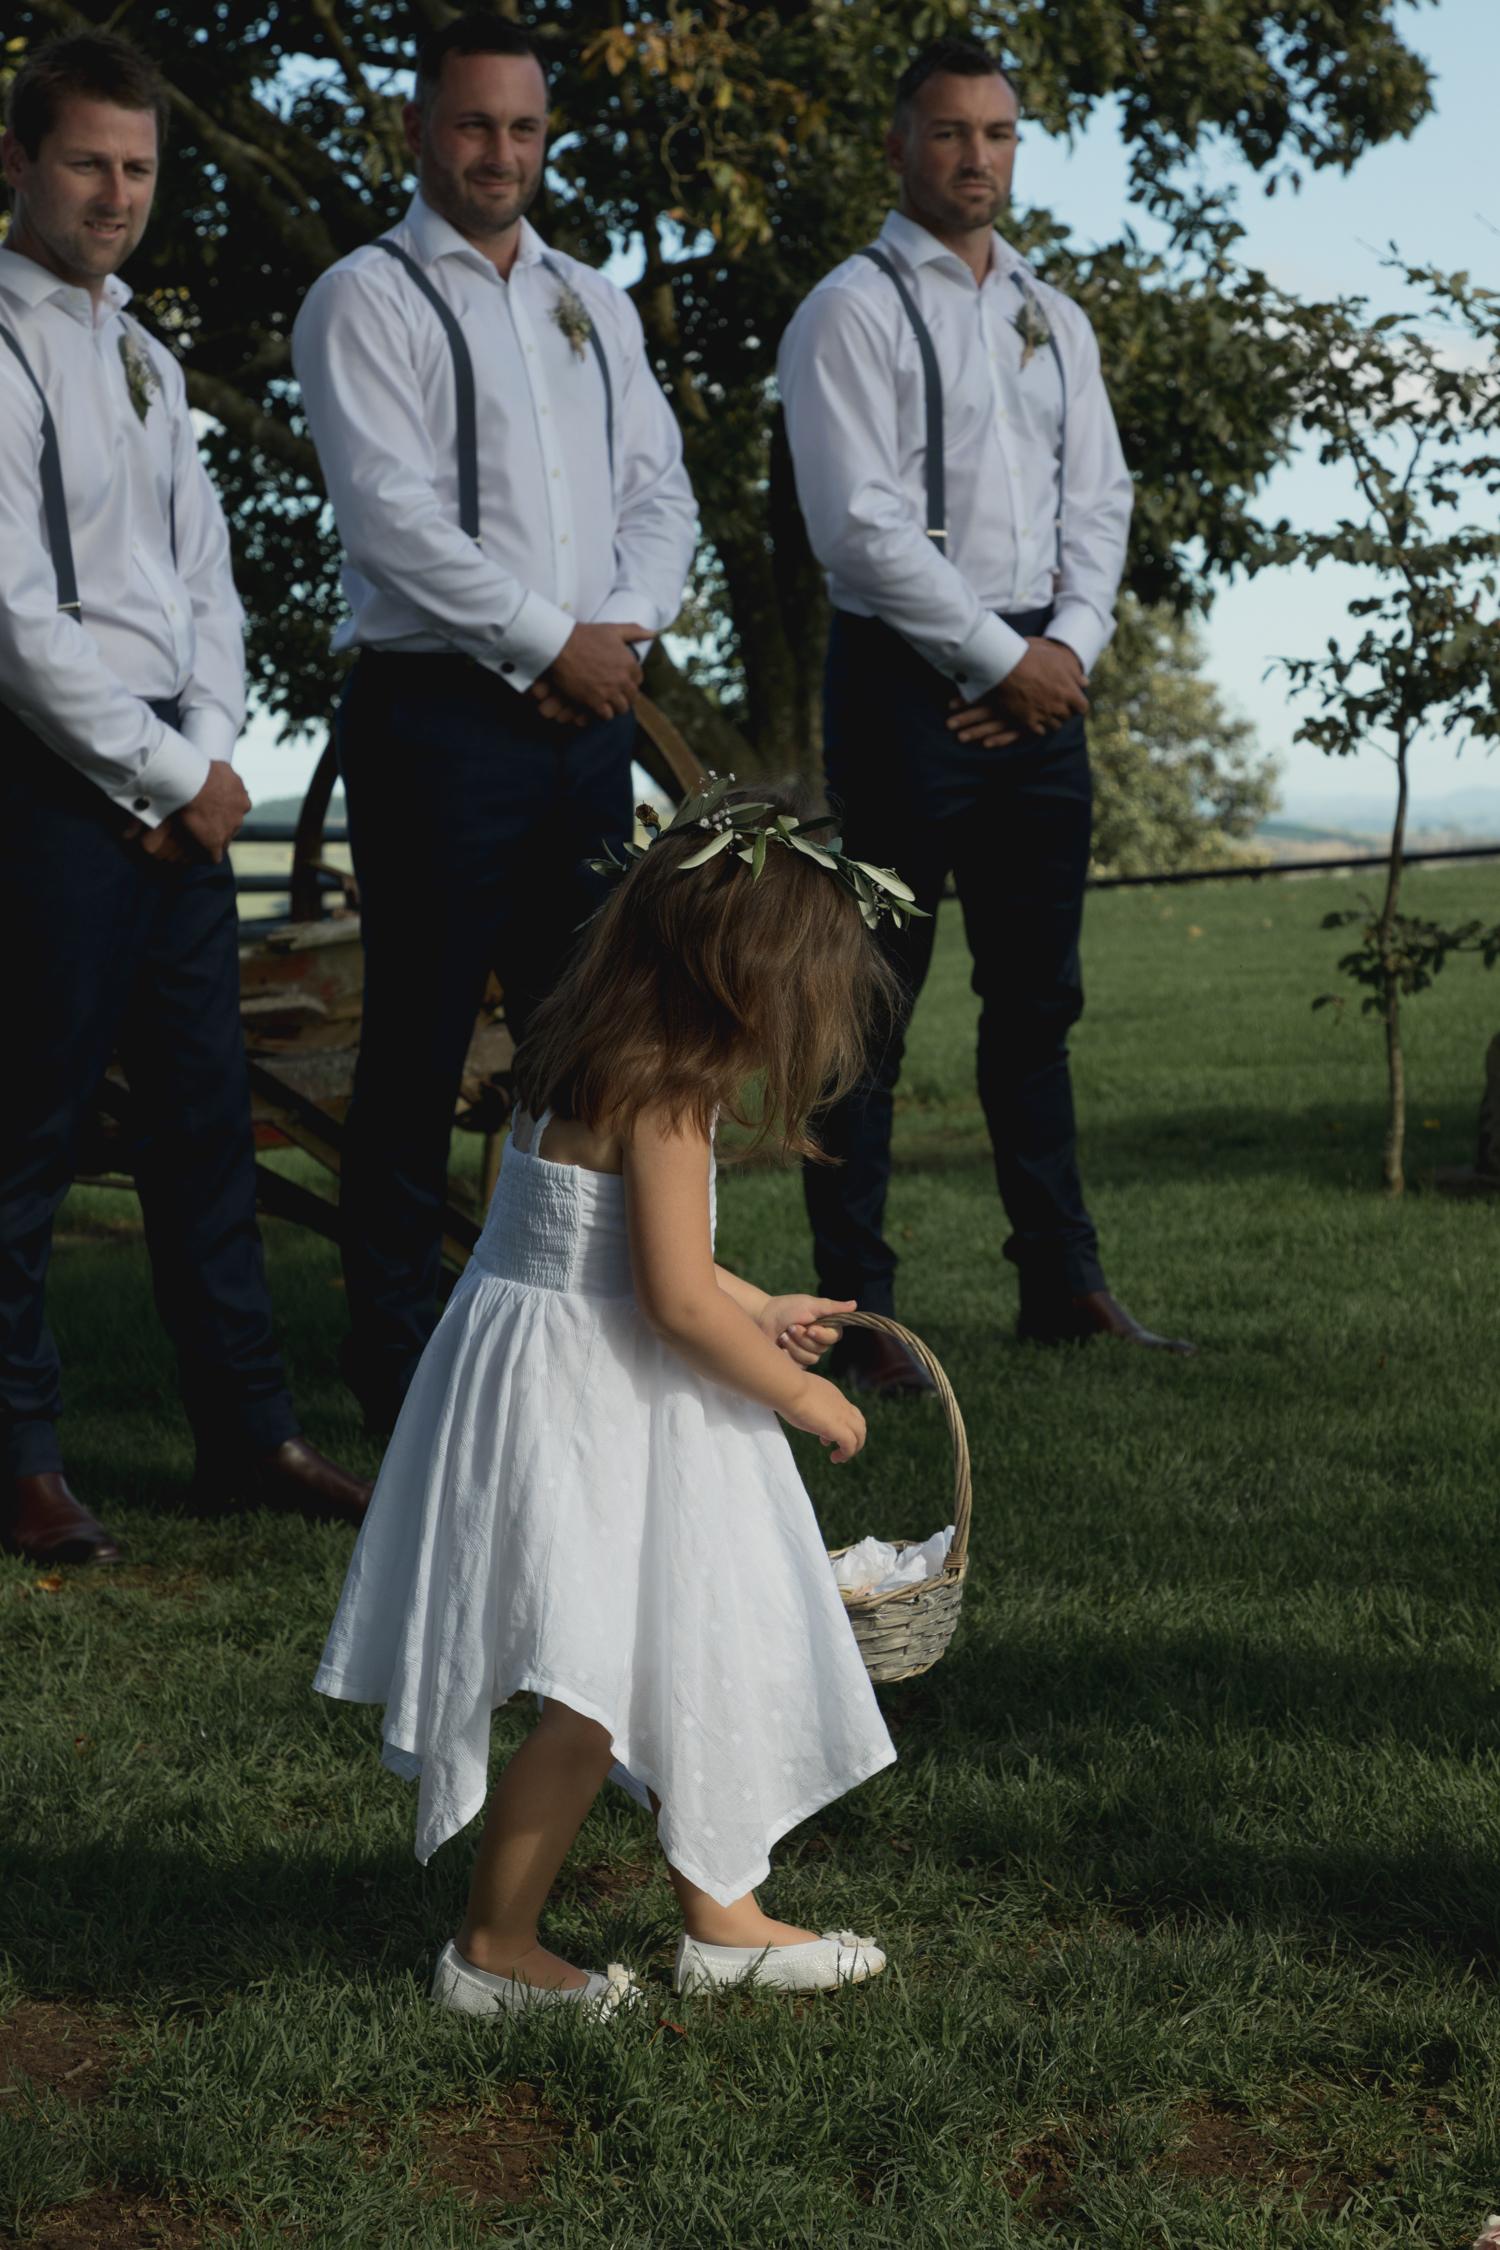 wedding-at-the-red-barn-new-zealand-wedding-photographer-flower-girl.jpg